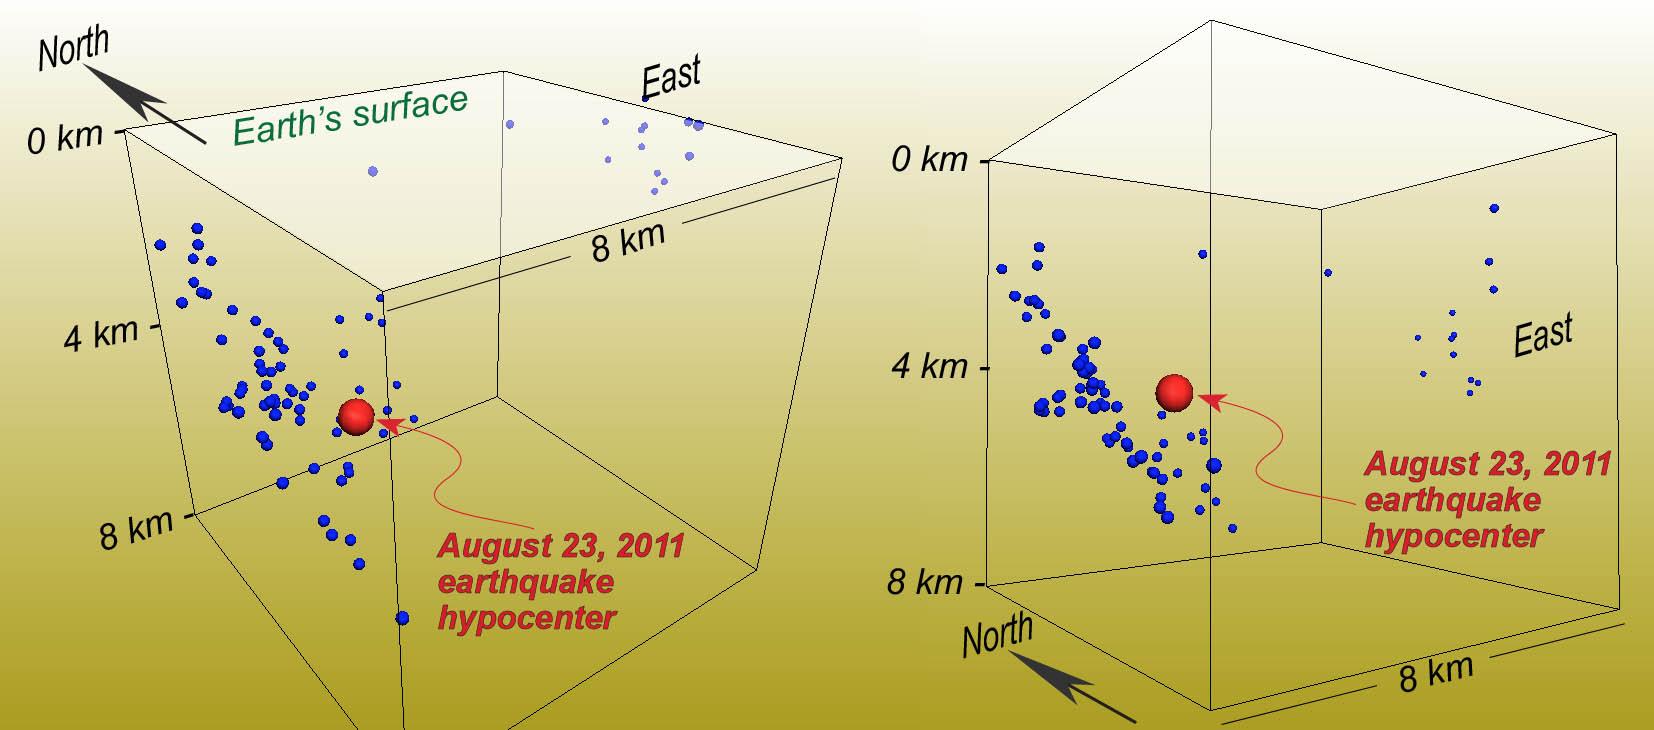 Aftershock Earthquake Diagram | www.pixshark.com - Images ...